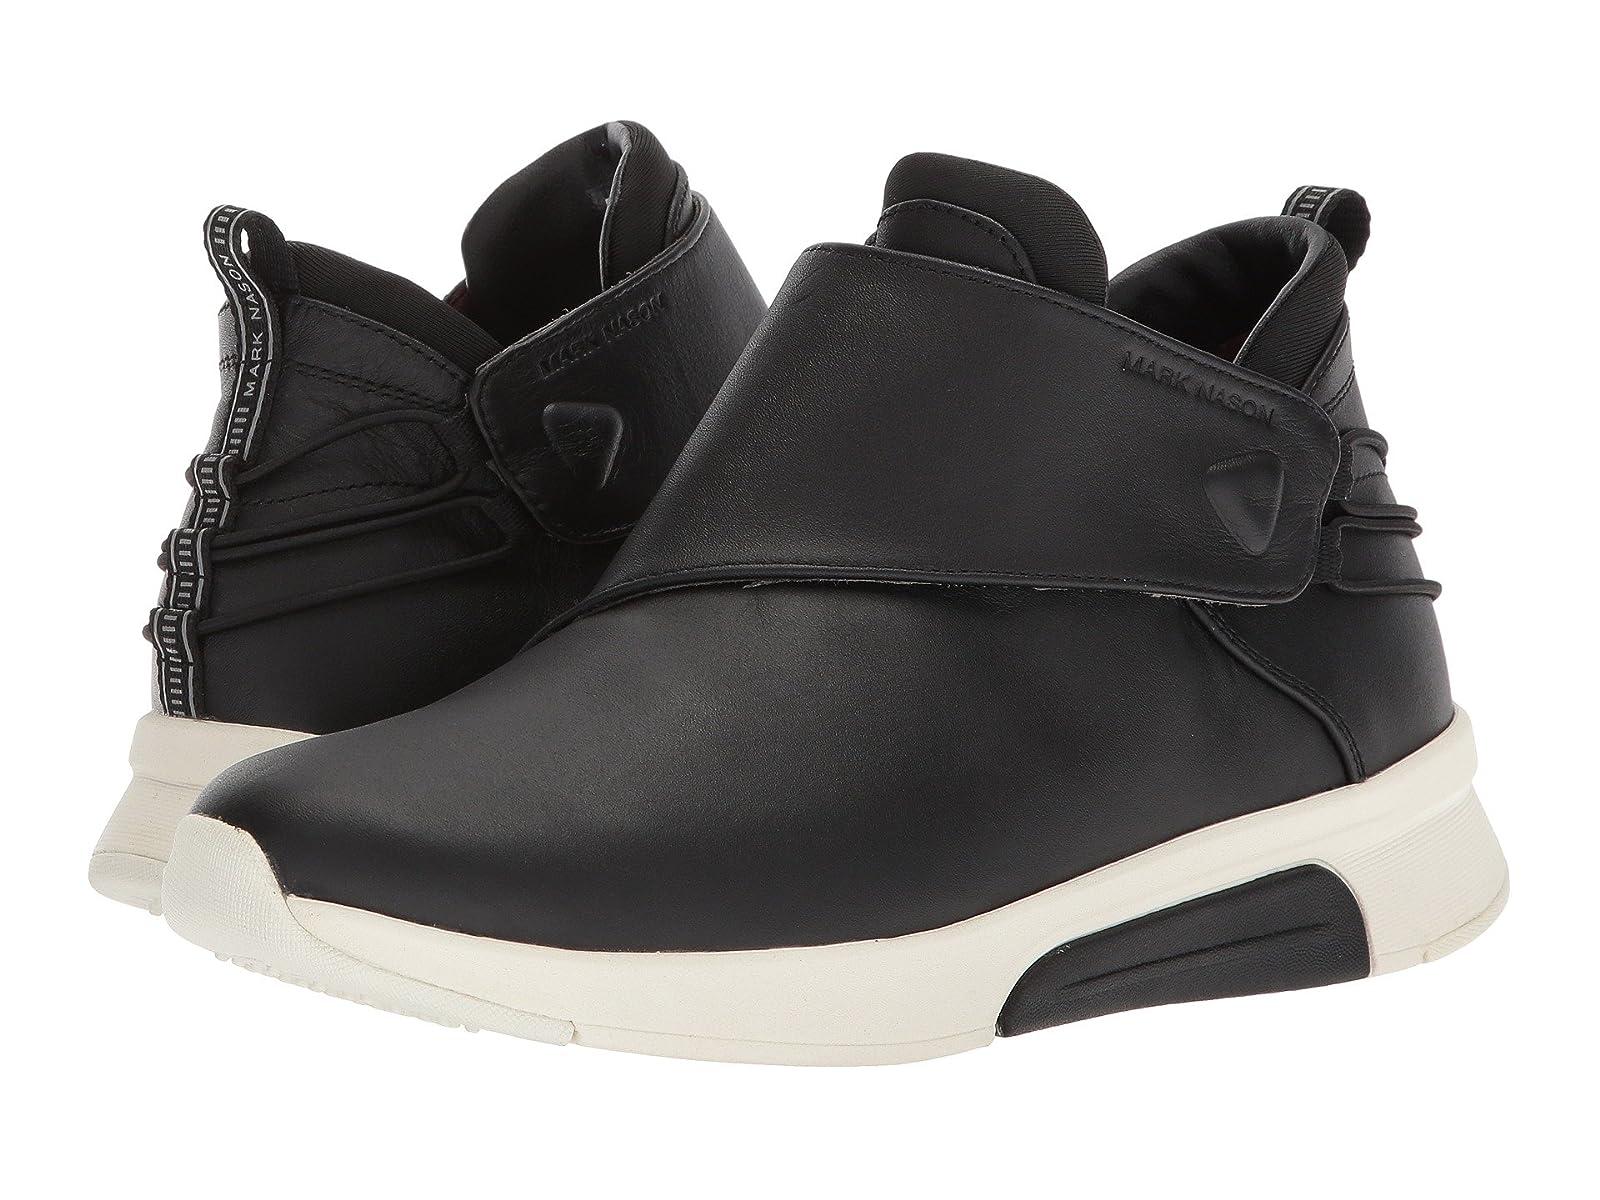 Mark Nason AltaAtmospheric grades have affordable shoes